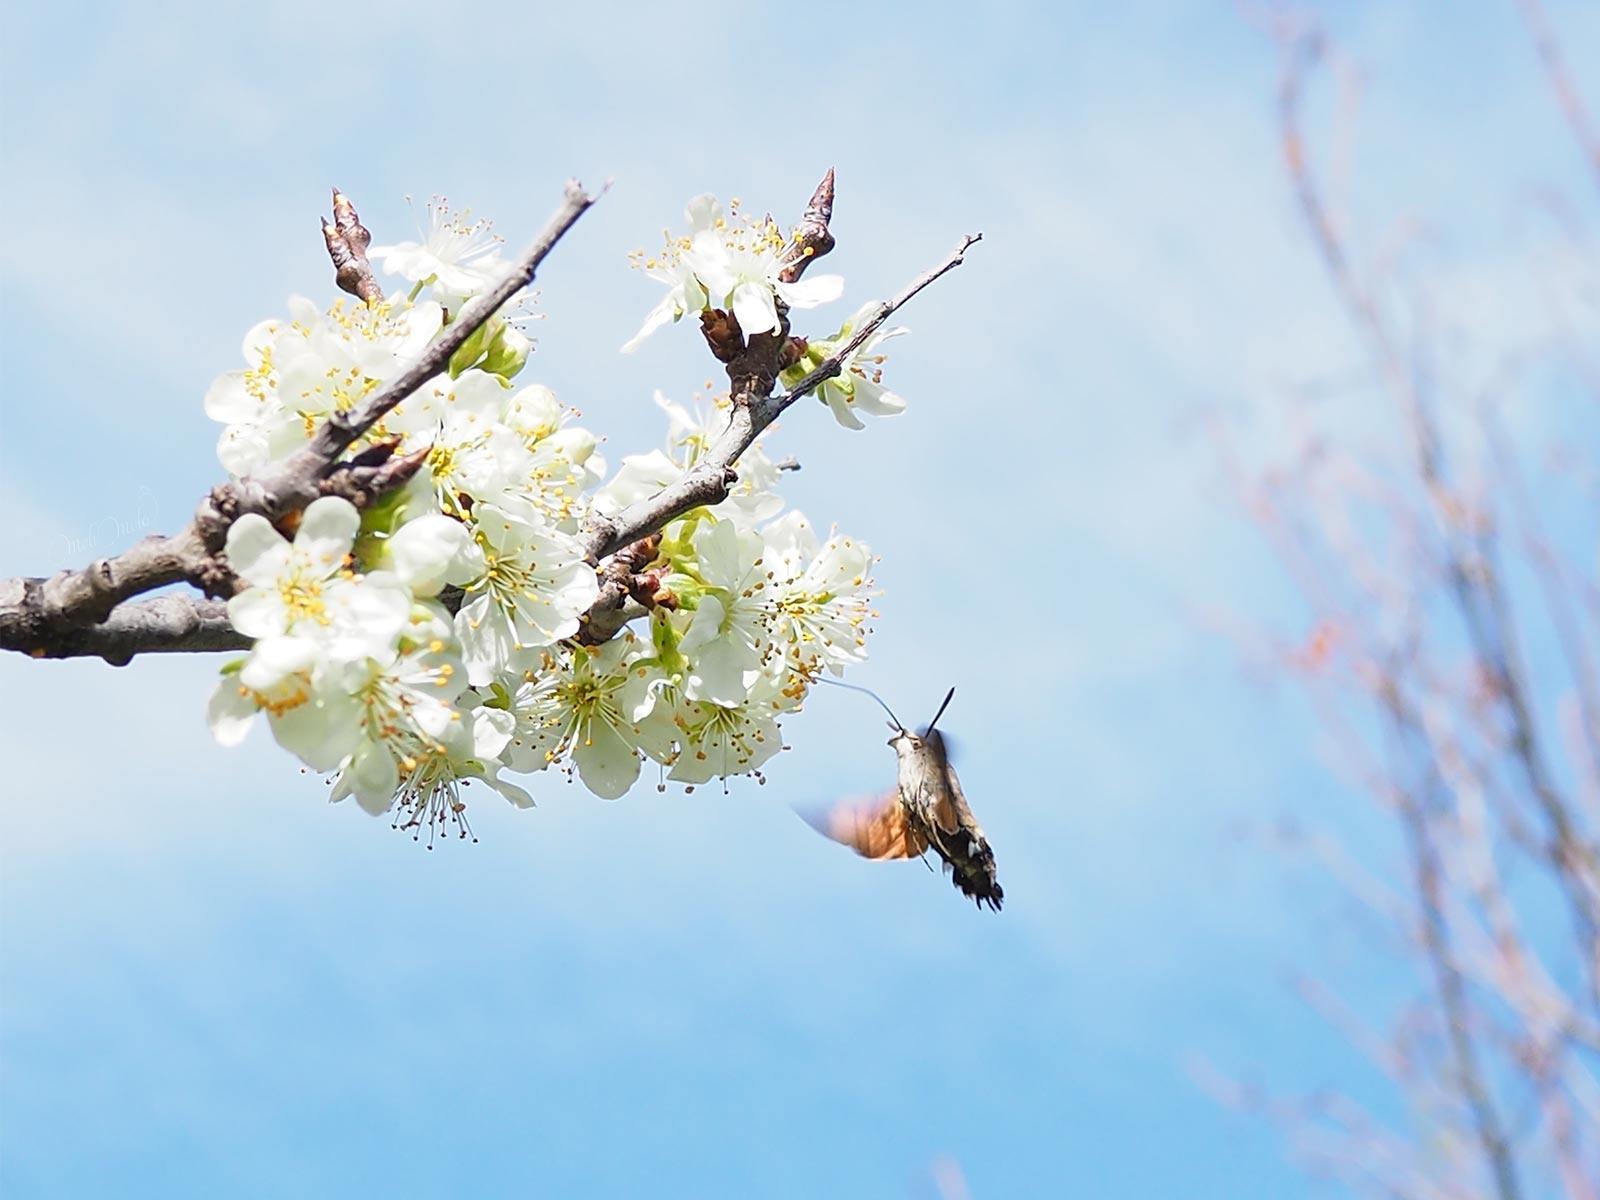 trompe papillon moro sphinx colibri avril printemps flowersbymelimelo laboutiquedemelimelo